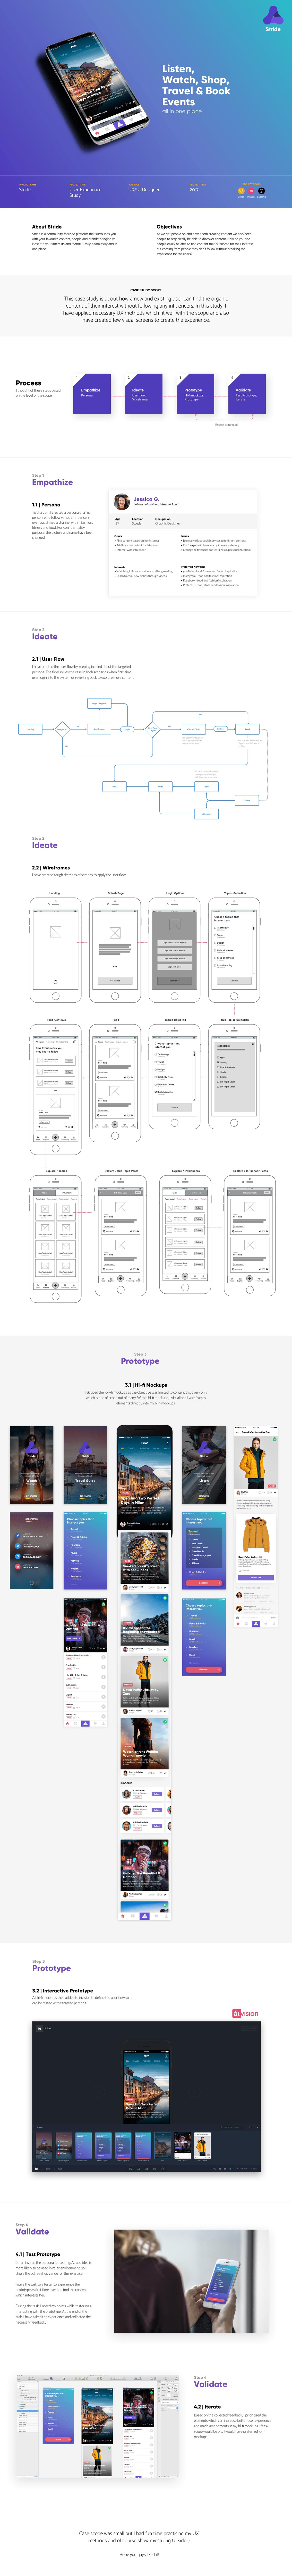 Case Study,visual design,user experience,wireframes,hi-fi mockups,lo-fi sketches,mobile,design,music